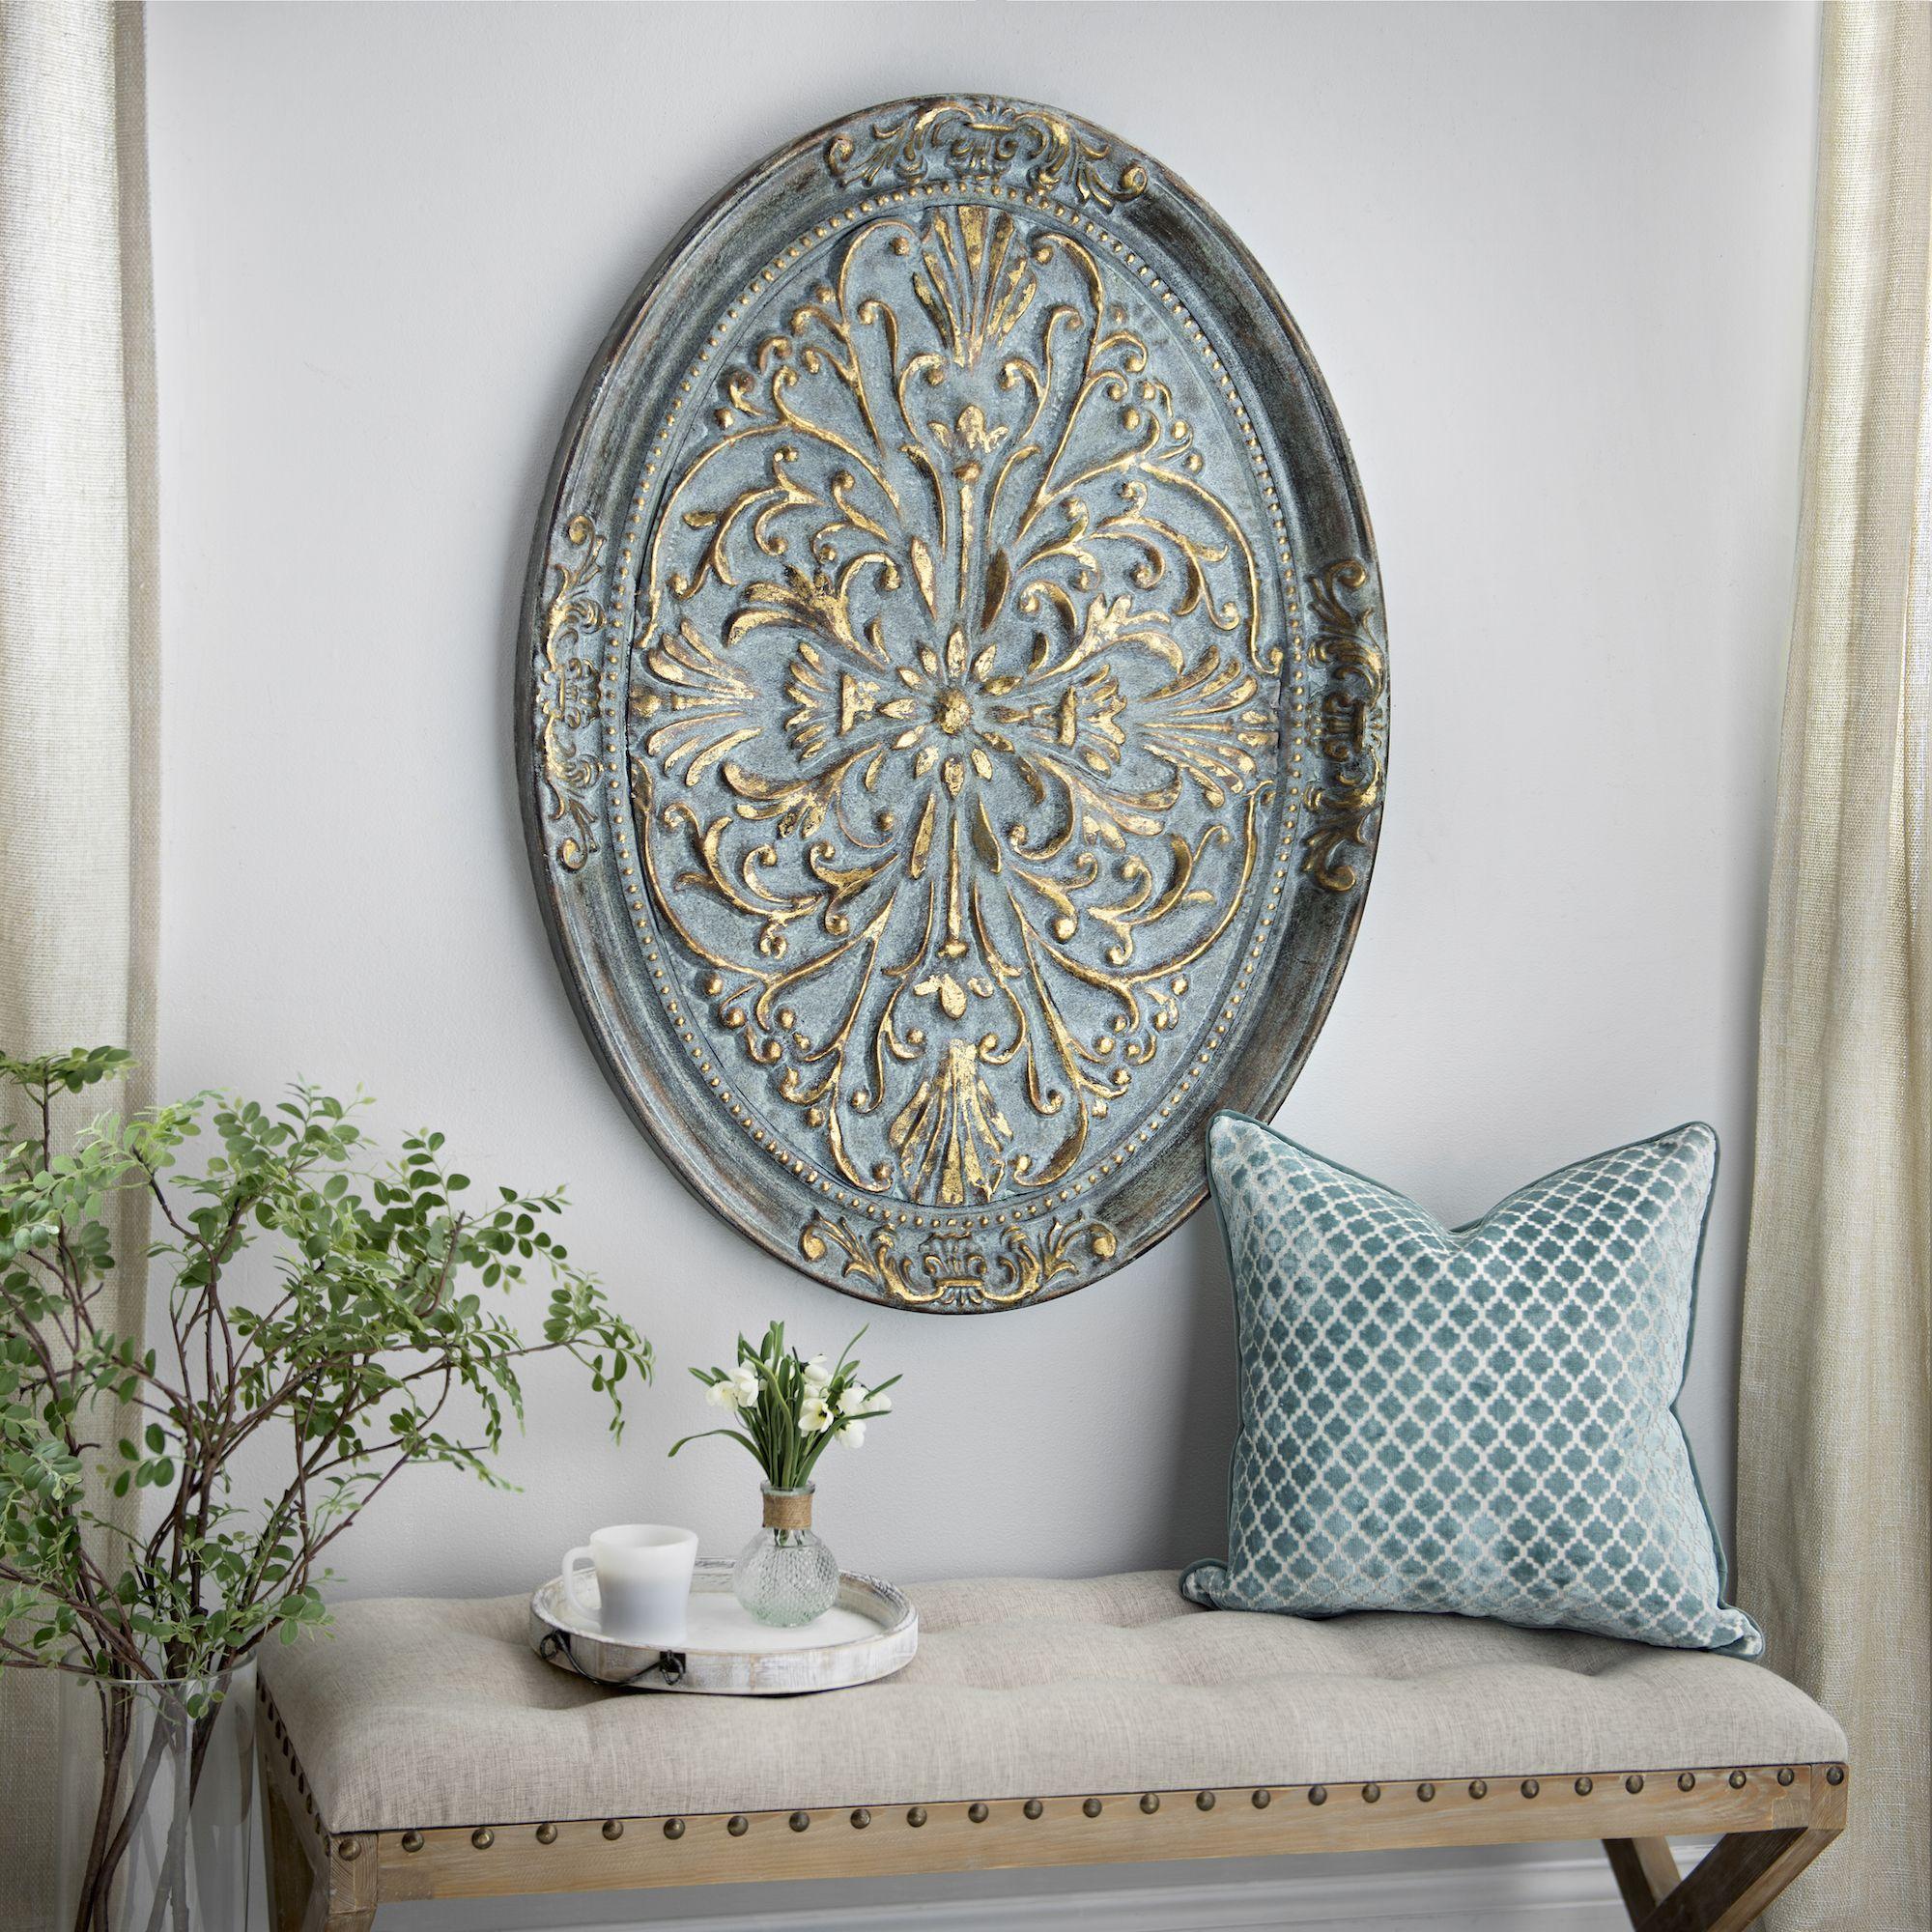 Gold Ornate Oval Metal Wall Plaque Metal Wall Plaques Kirkland Home Decor Decor